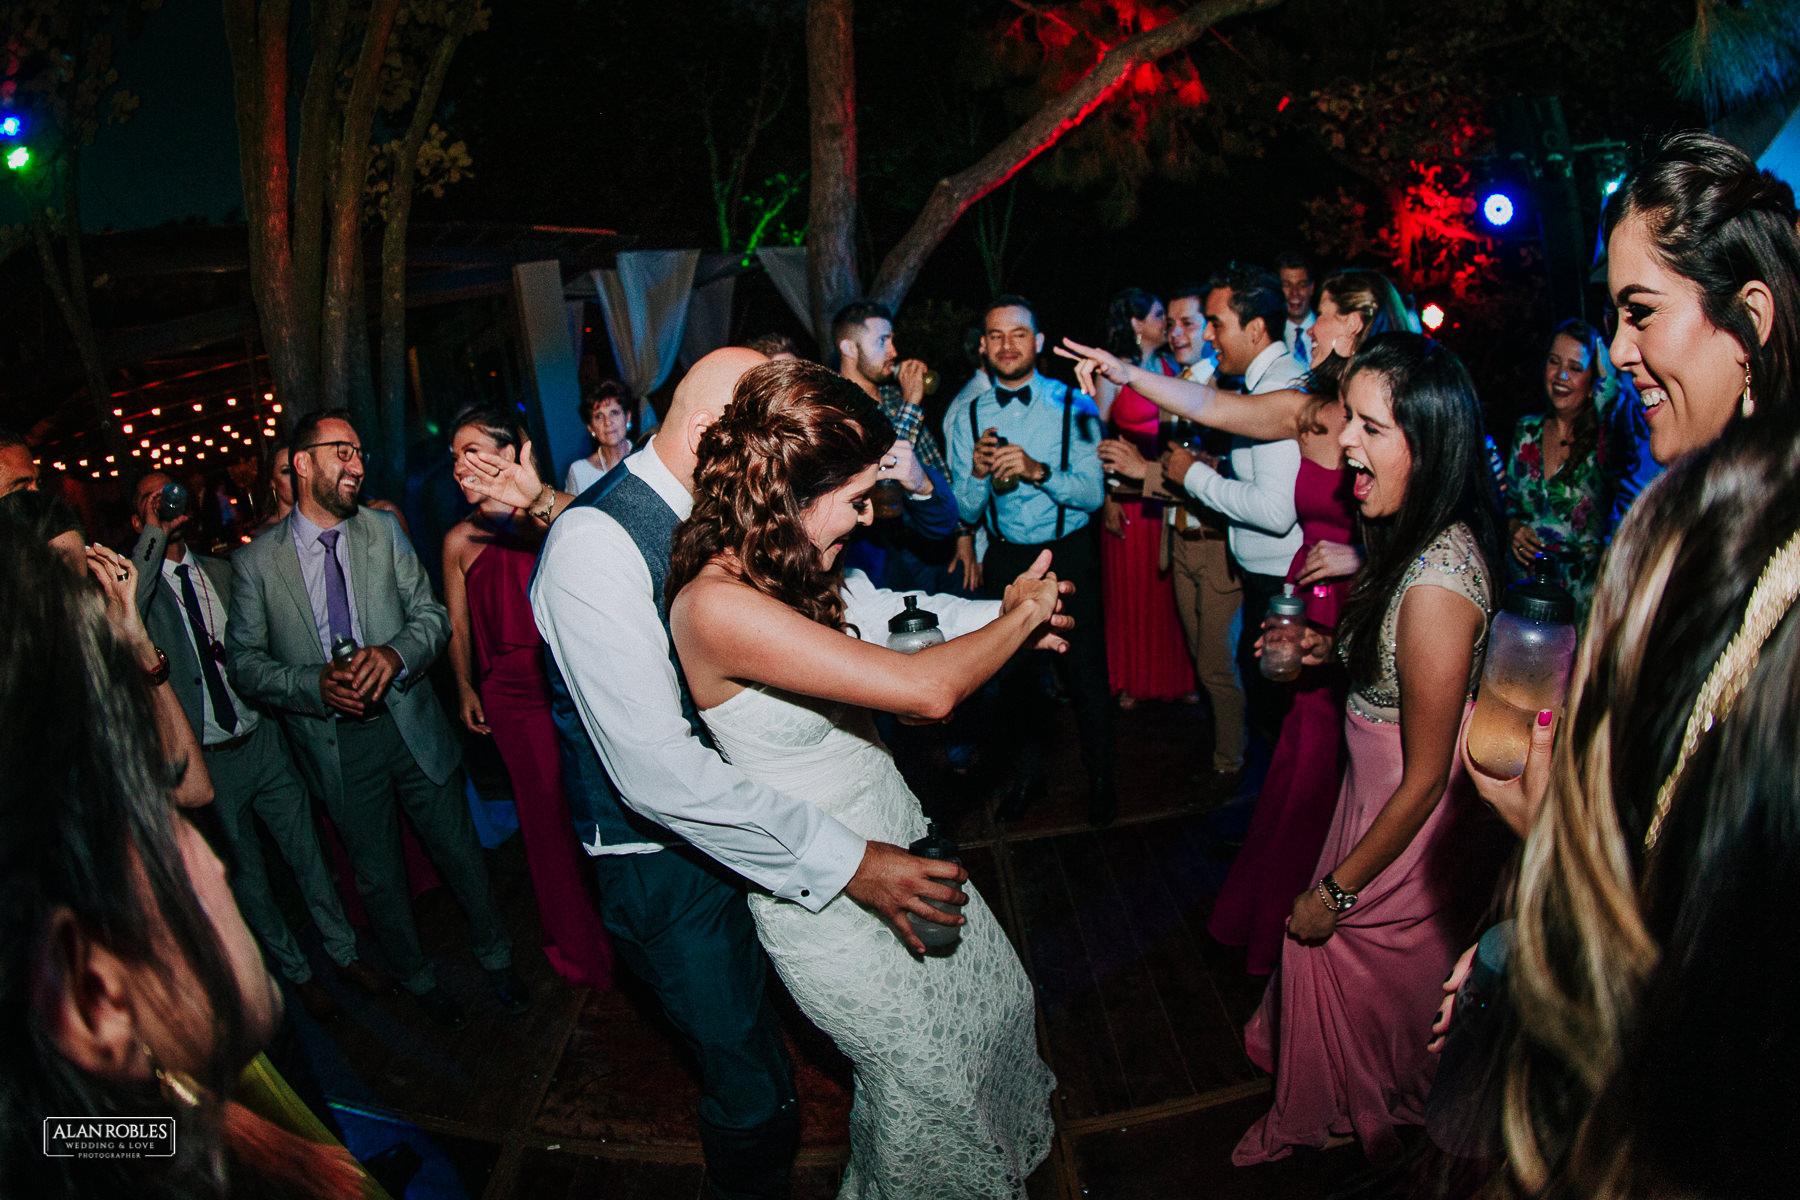 Fotografo de bodas guadalajara Alan Robles - Pinare terraza bistro 62